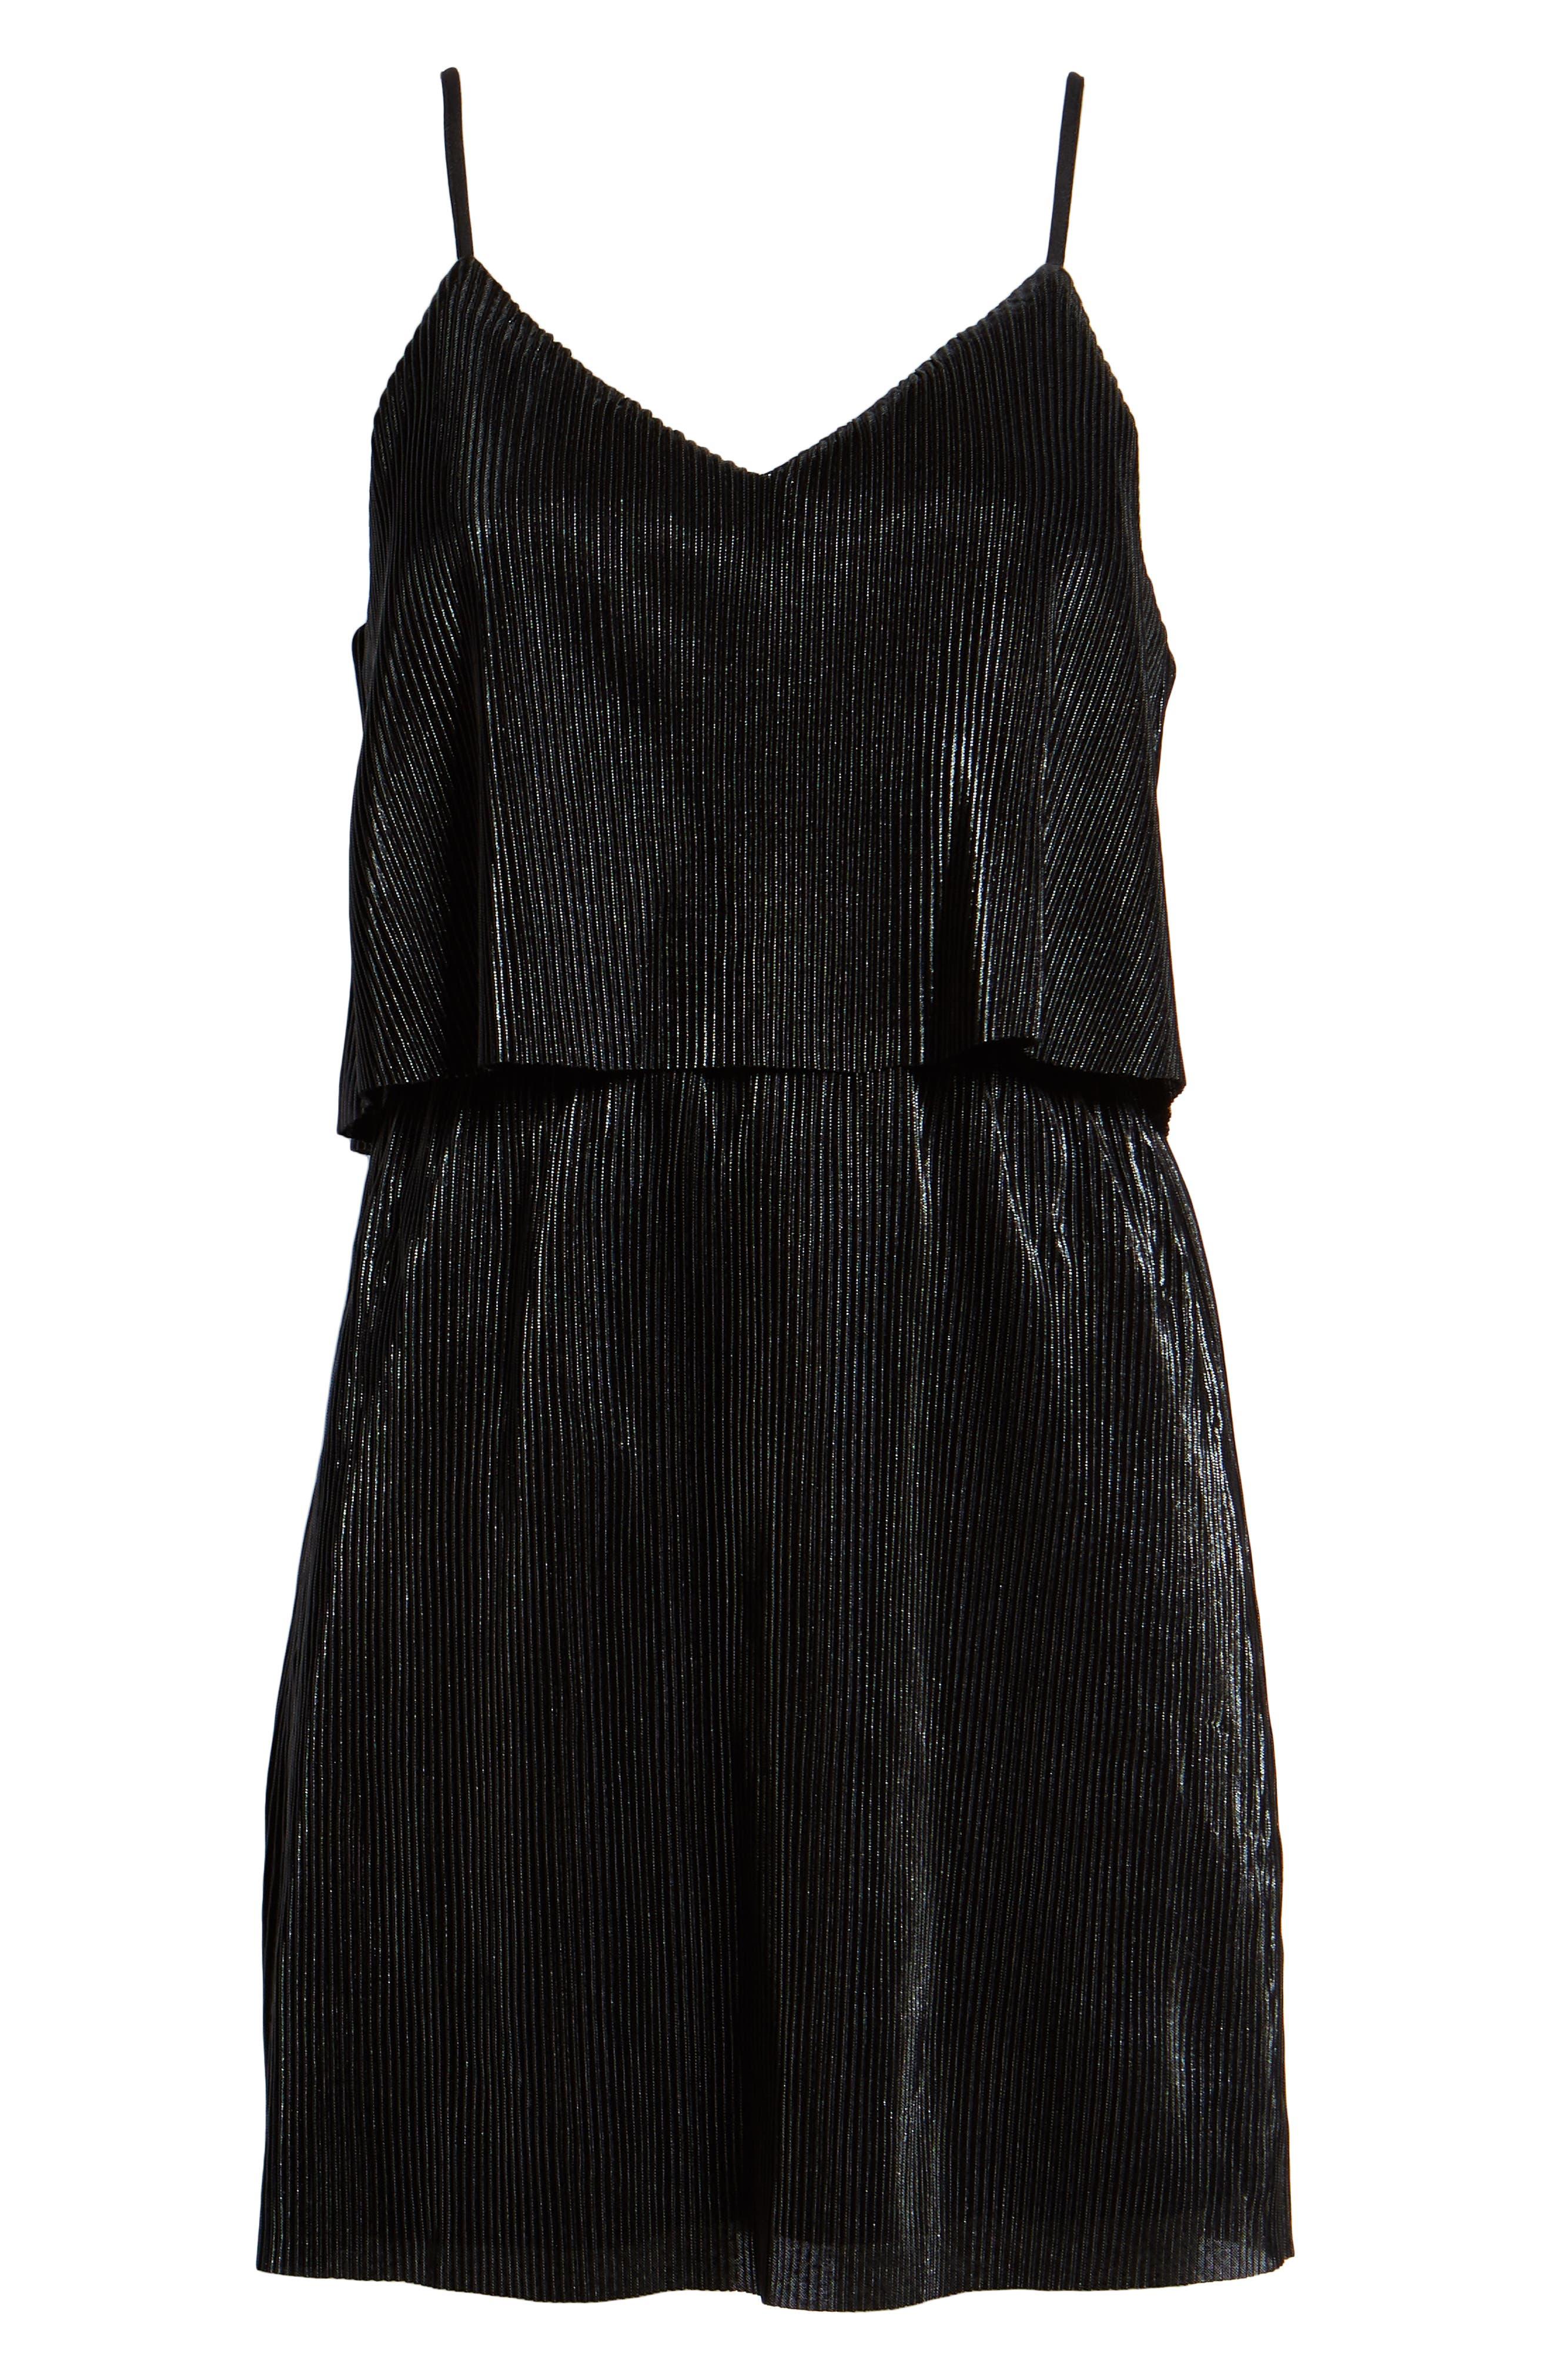 Shine On Shine On Pleated Dress,                             Alternate thumbnail 7, color,                             BLACK